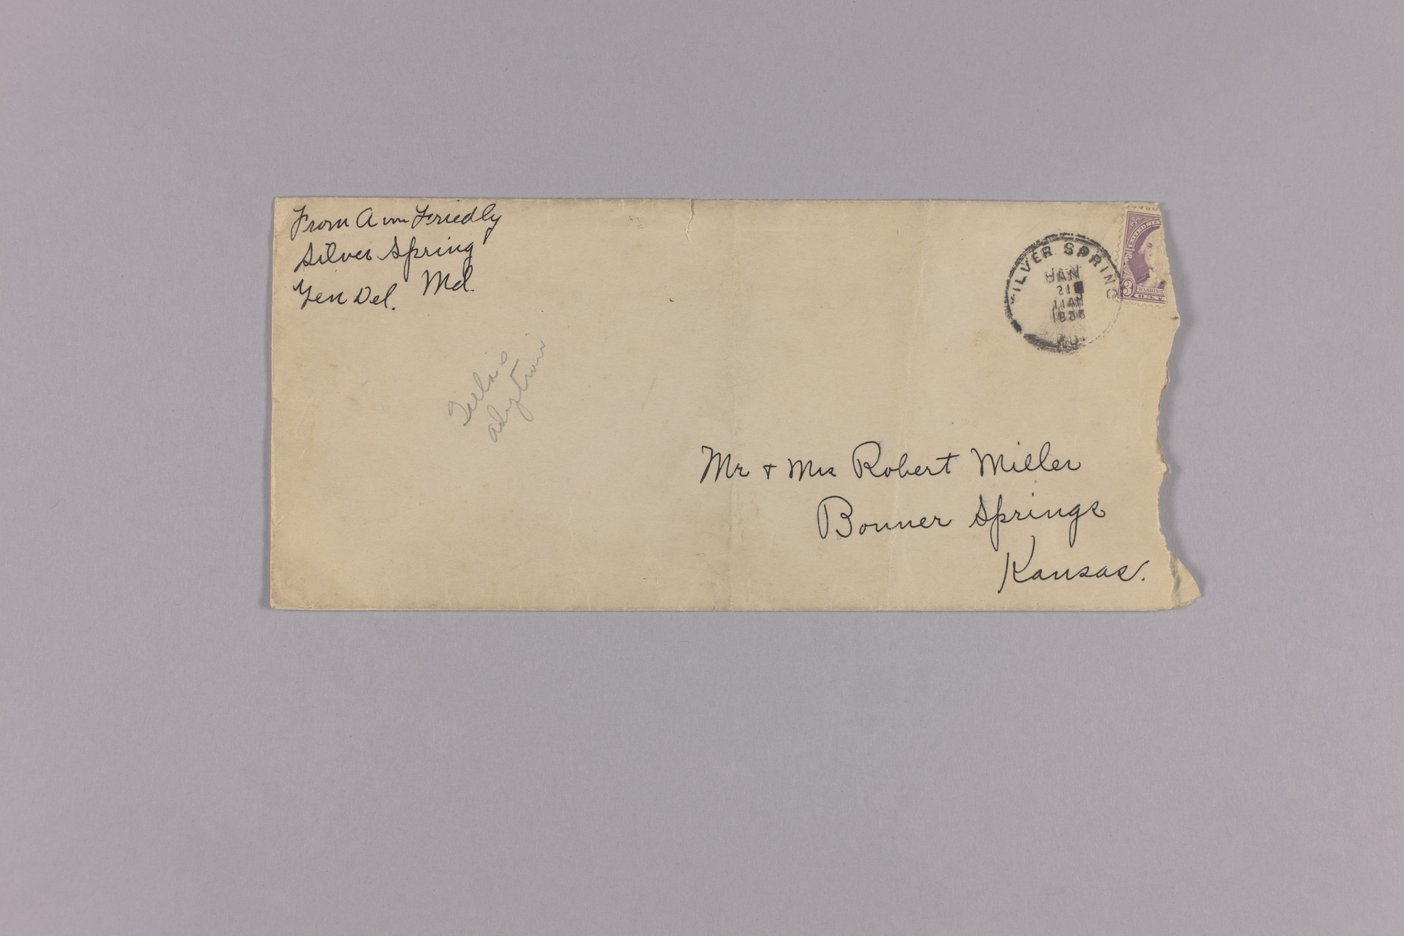 Bonner Springs adoption, correspondence - 11